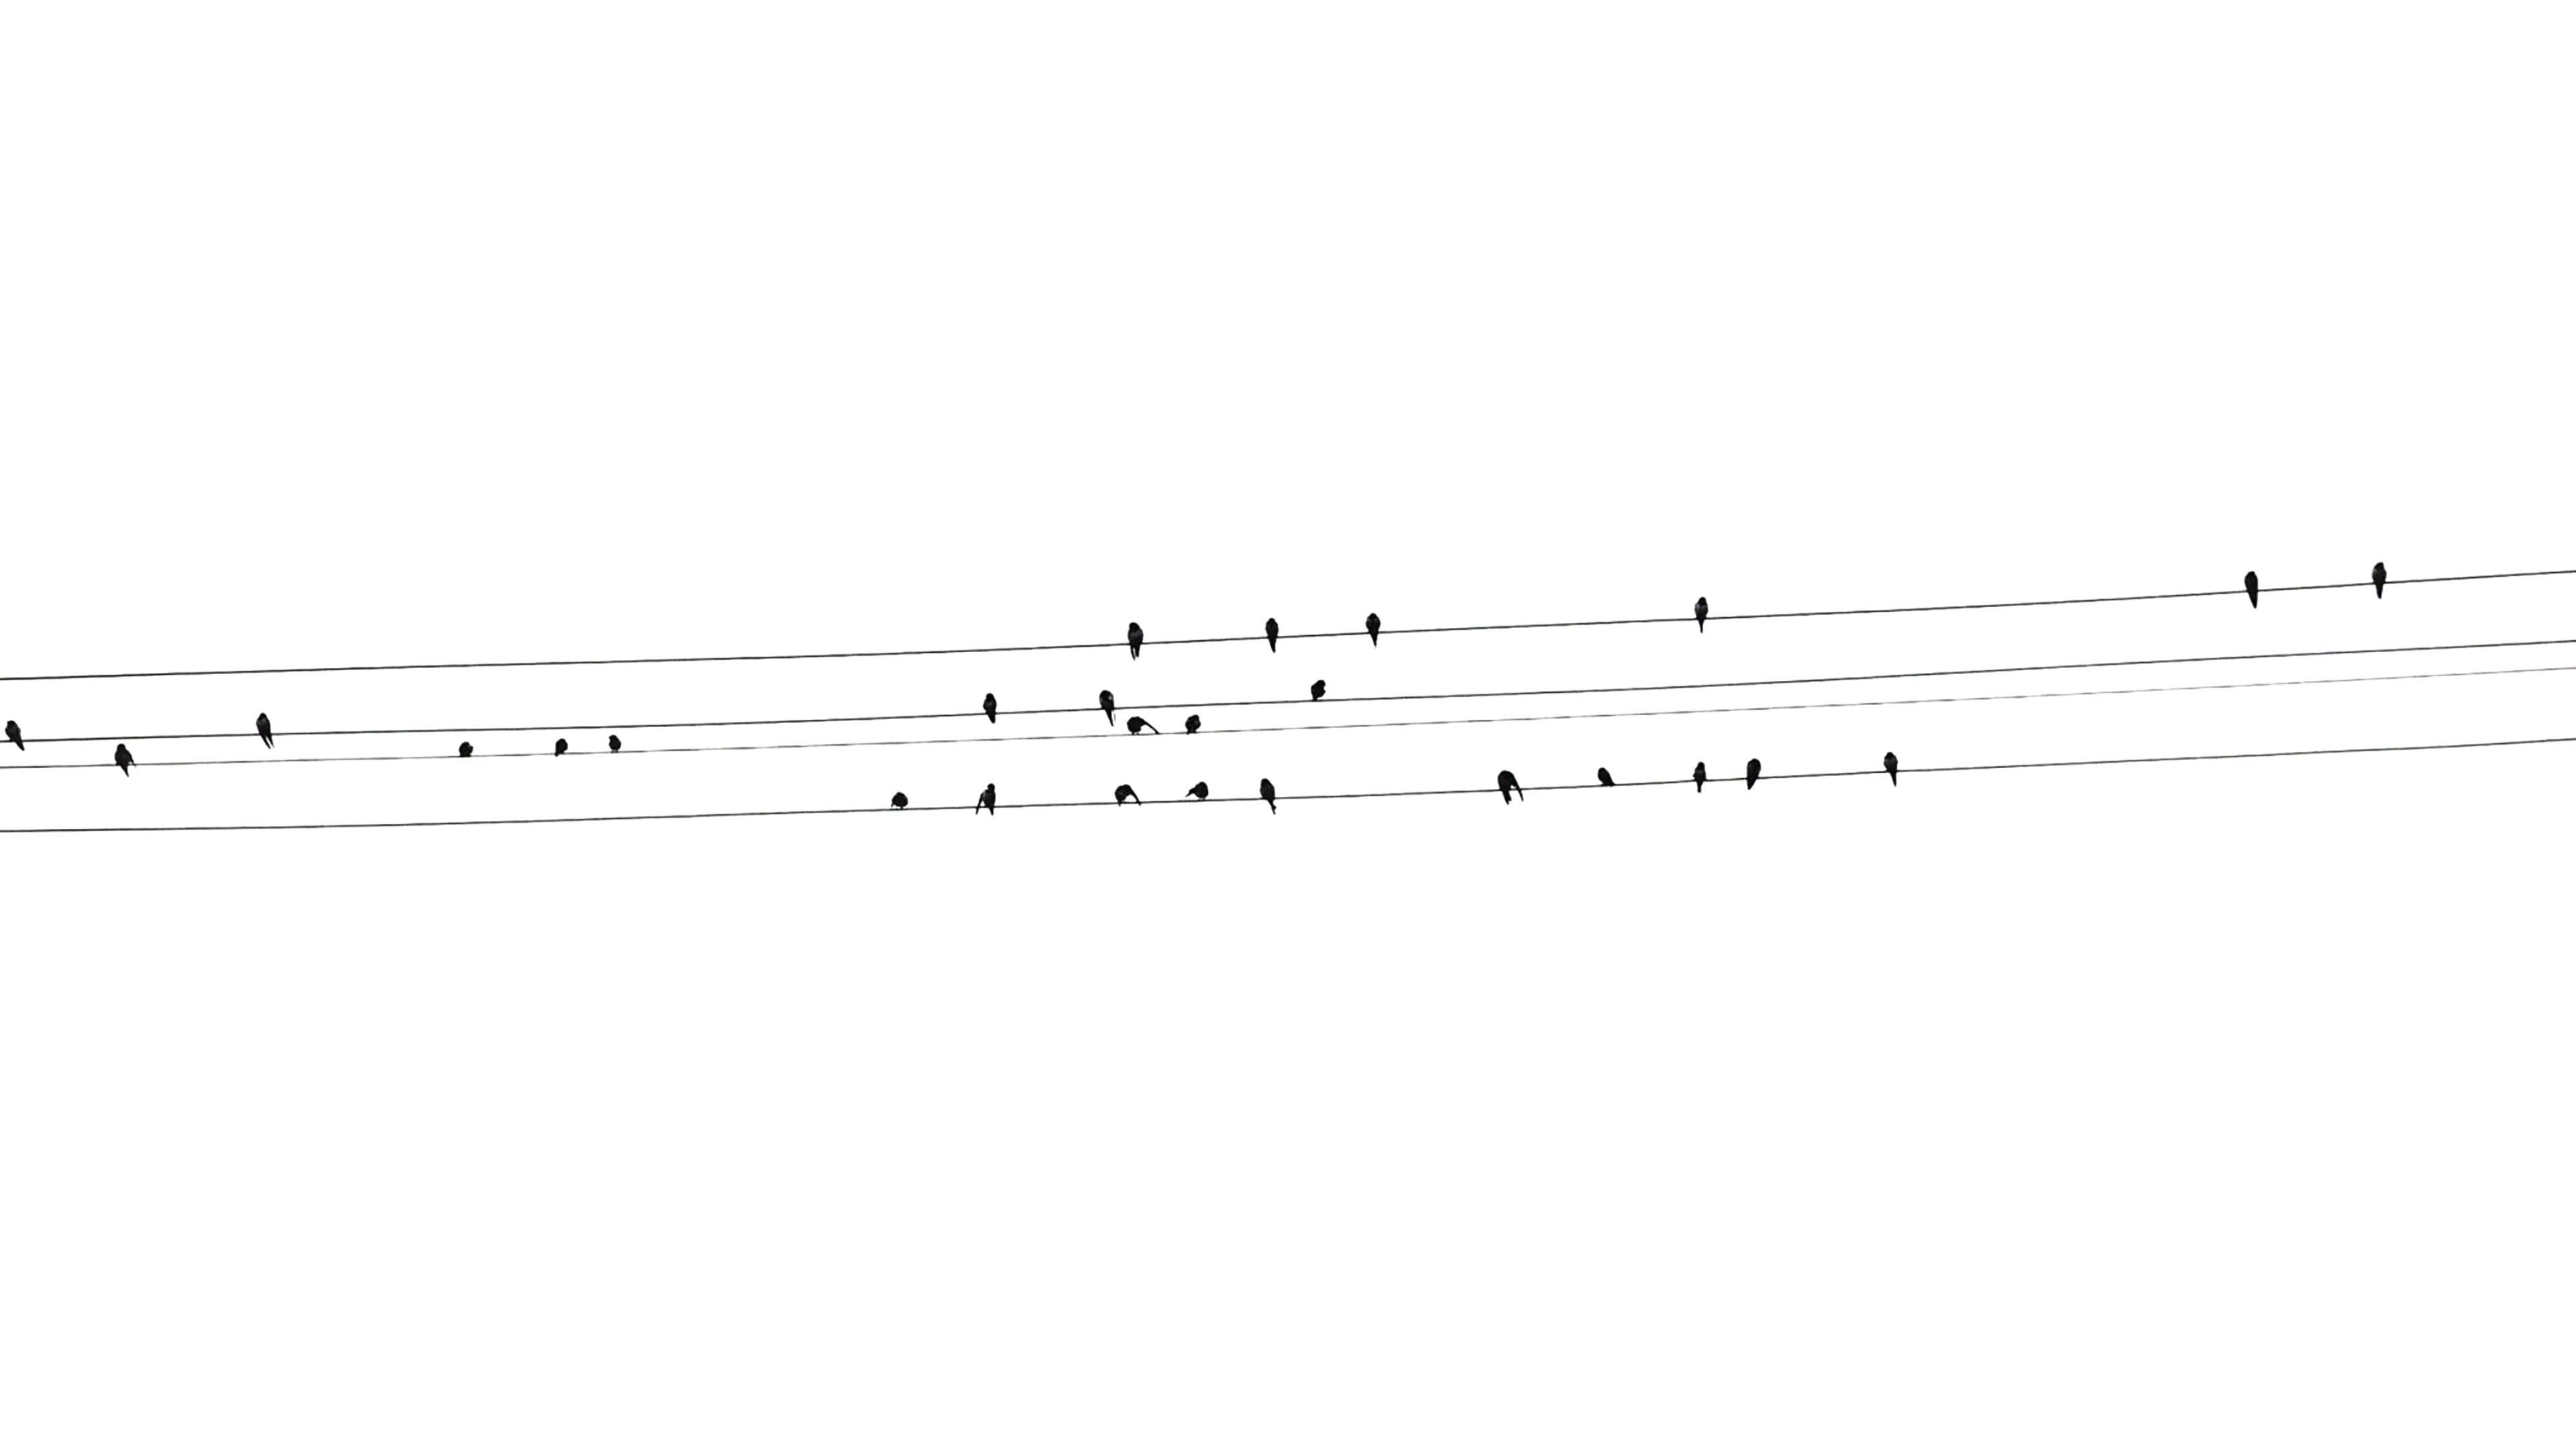 Desktoppapers Co Ad91 Birds Nature Minimal White